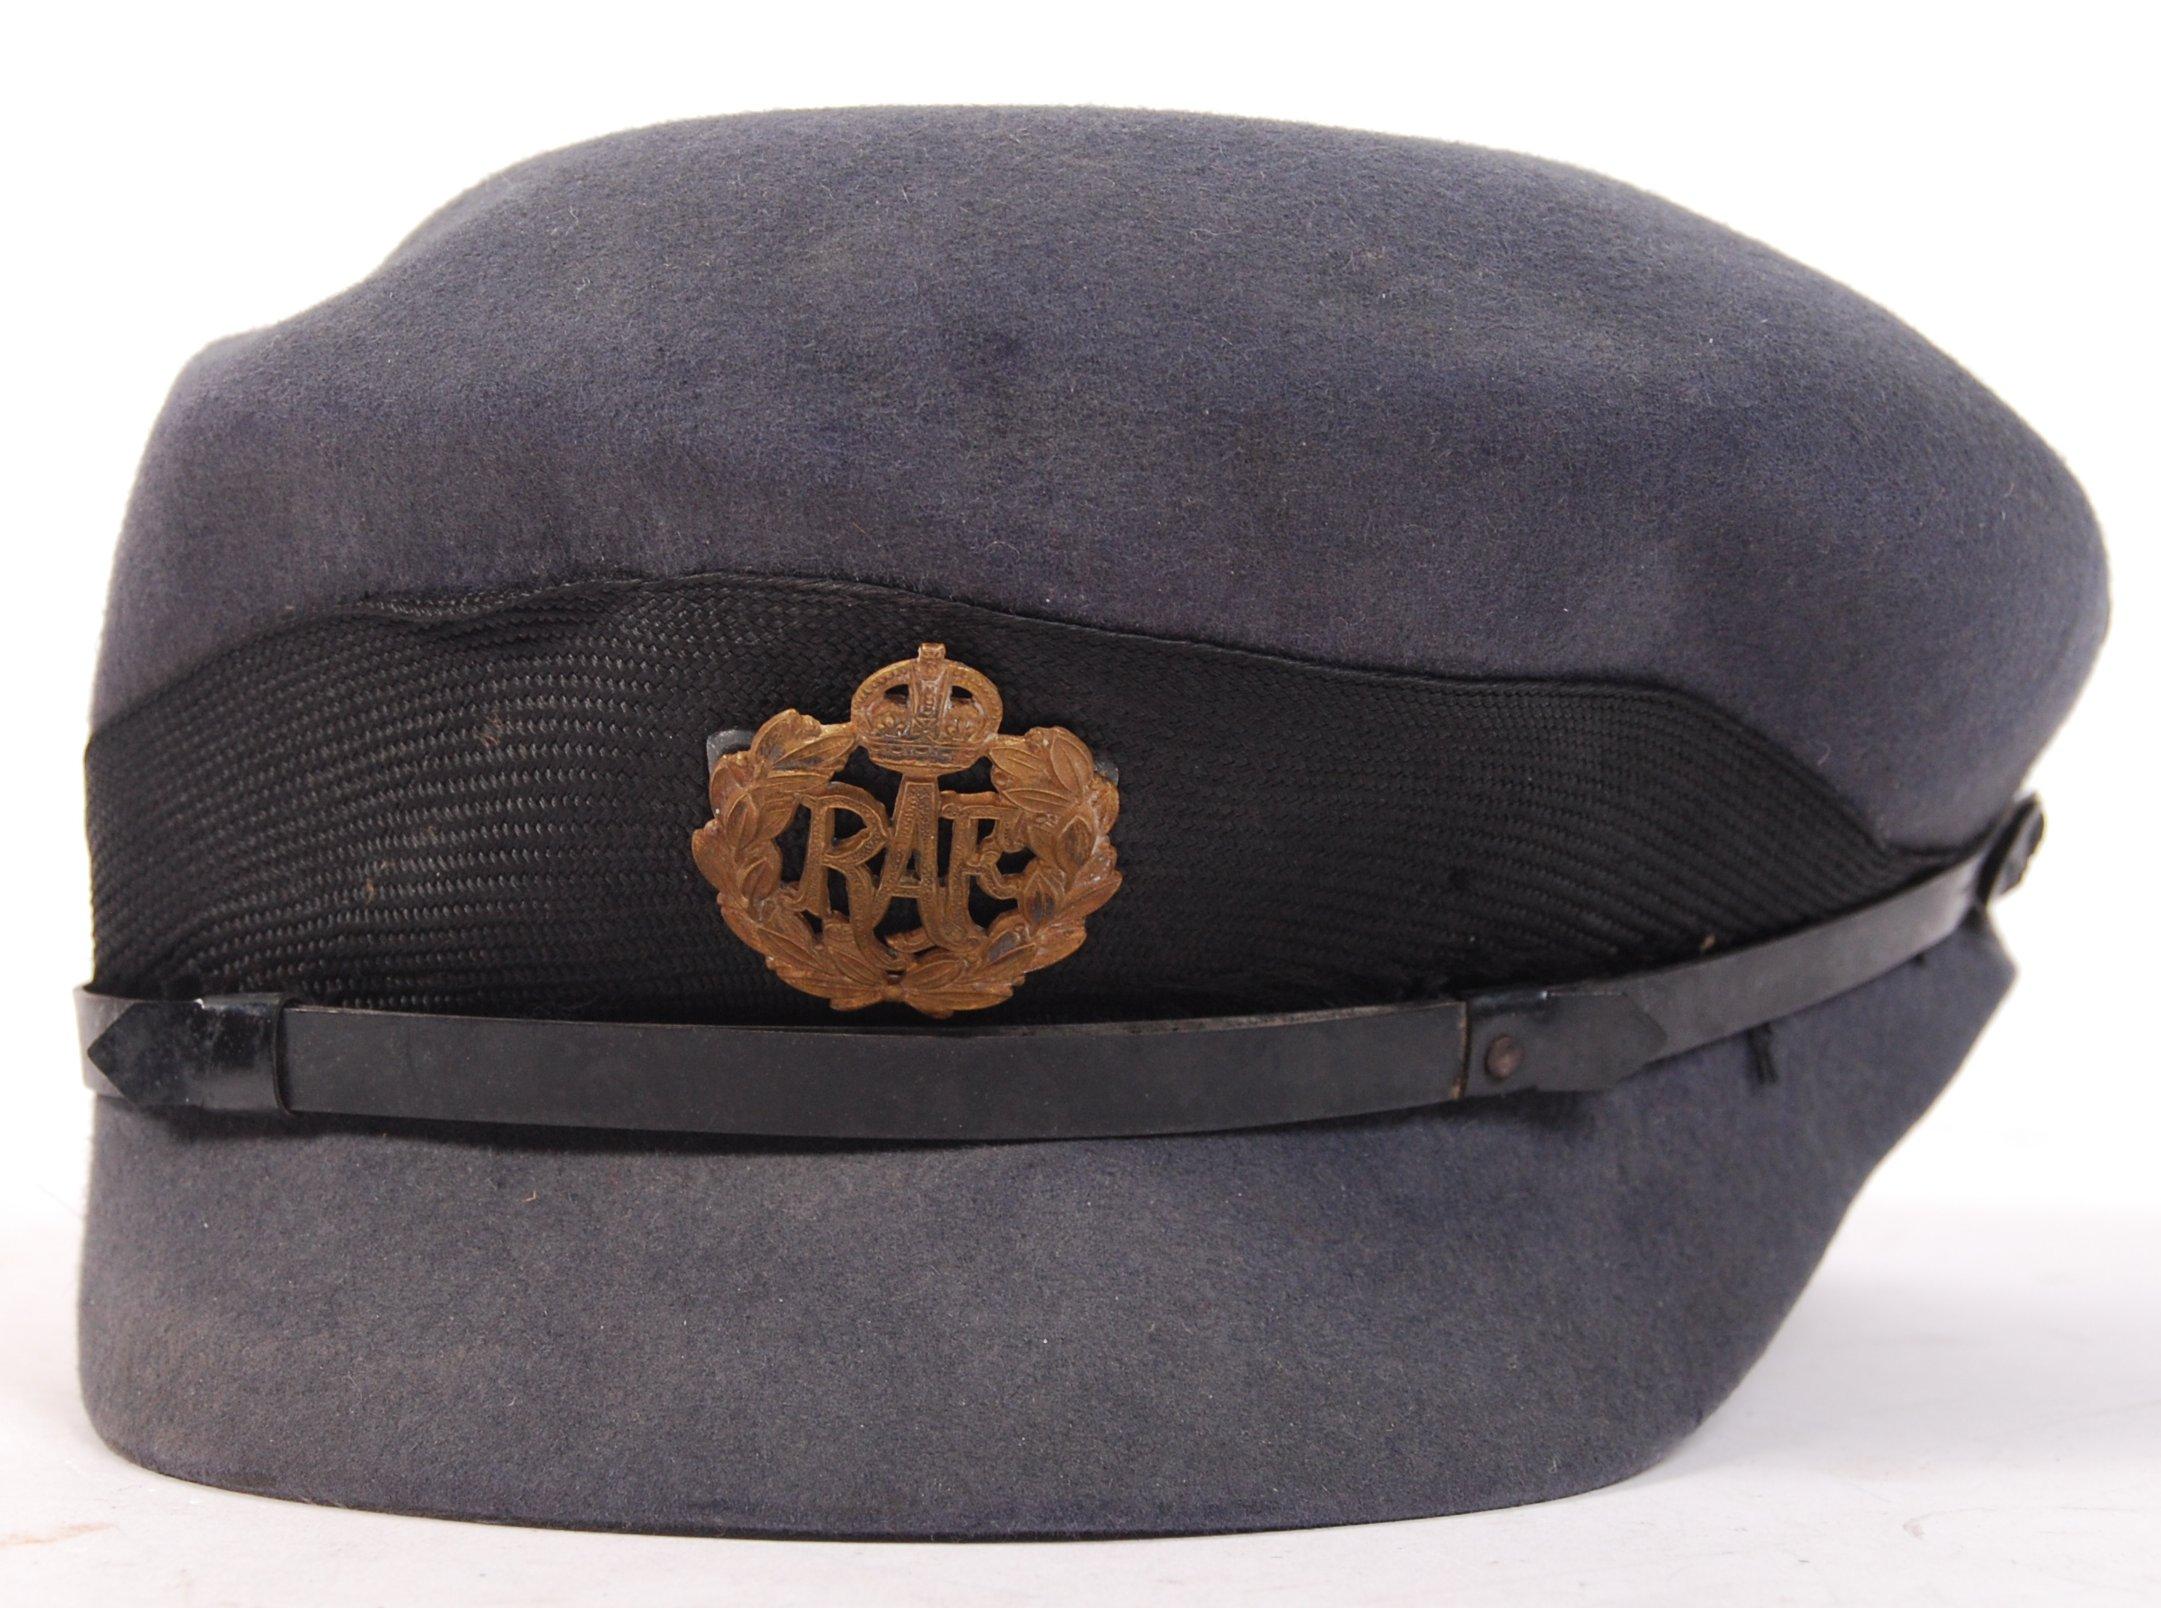 POST-WWII SECOND WORLD WAR RARE WRAF SERVICE CAP